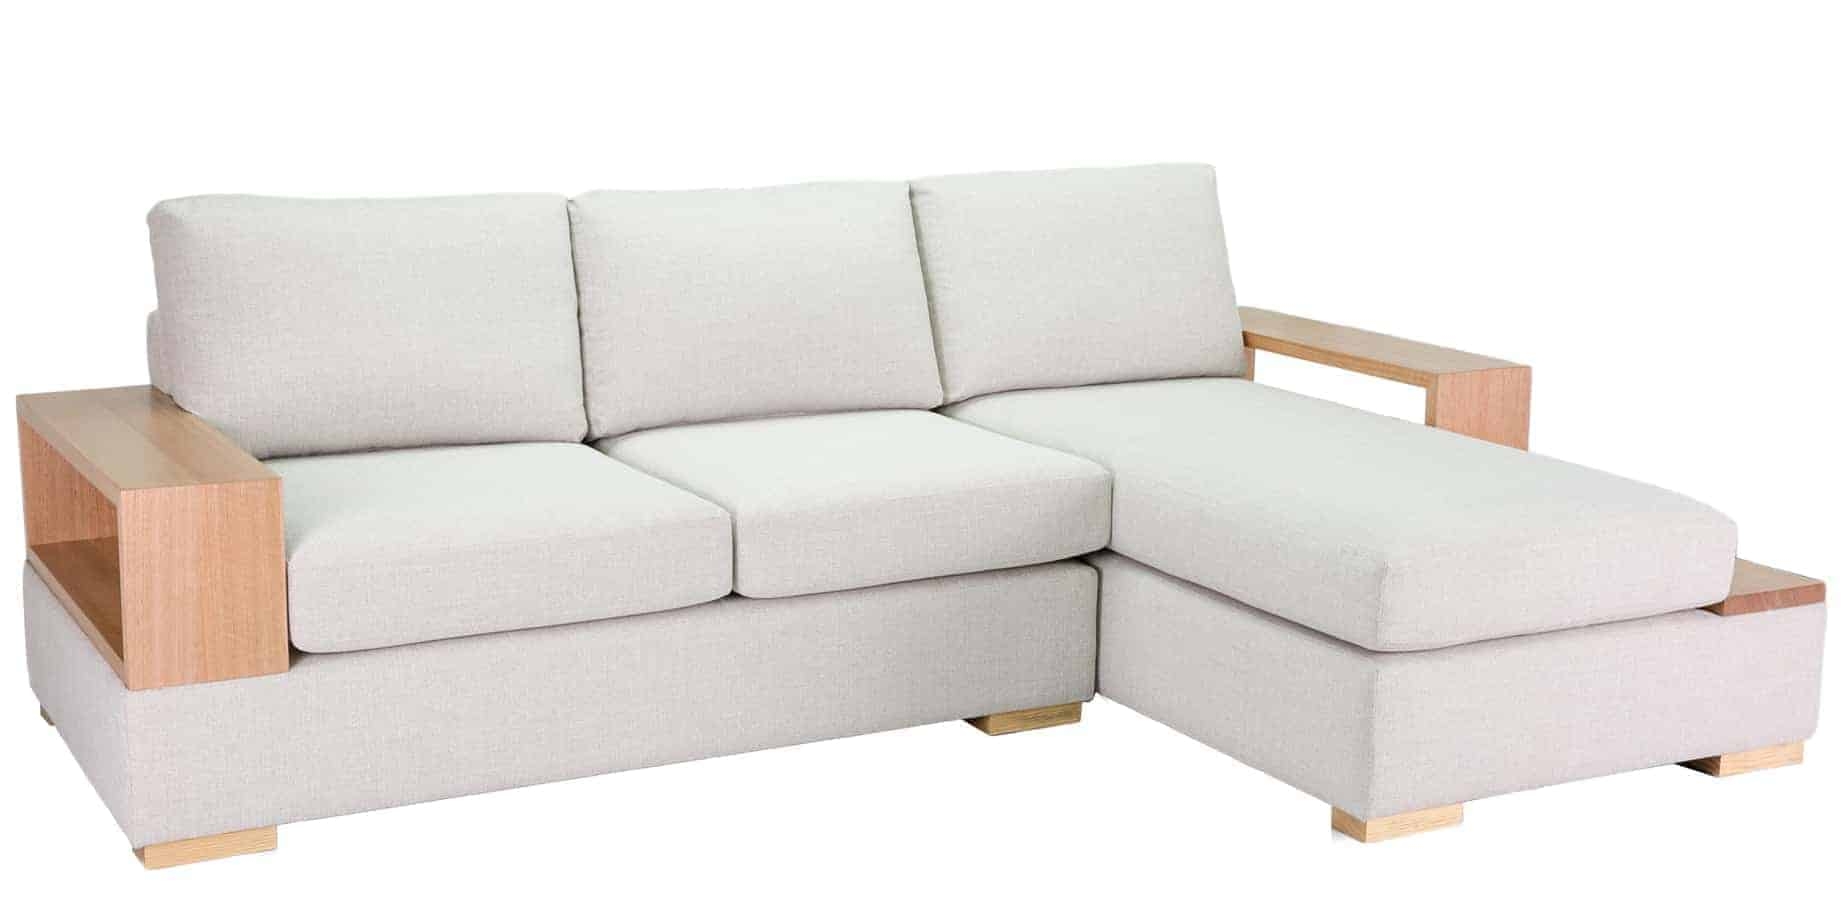 Bookcase sofa lounge chaise corner modular custom made australian made buy furniture from the ydney Furniture Factory